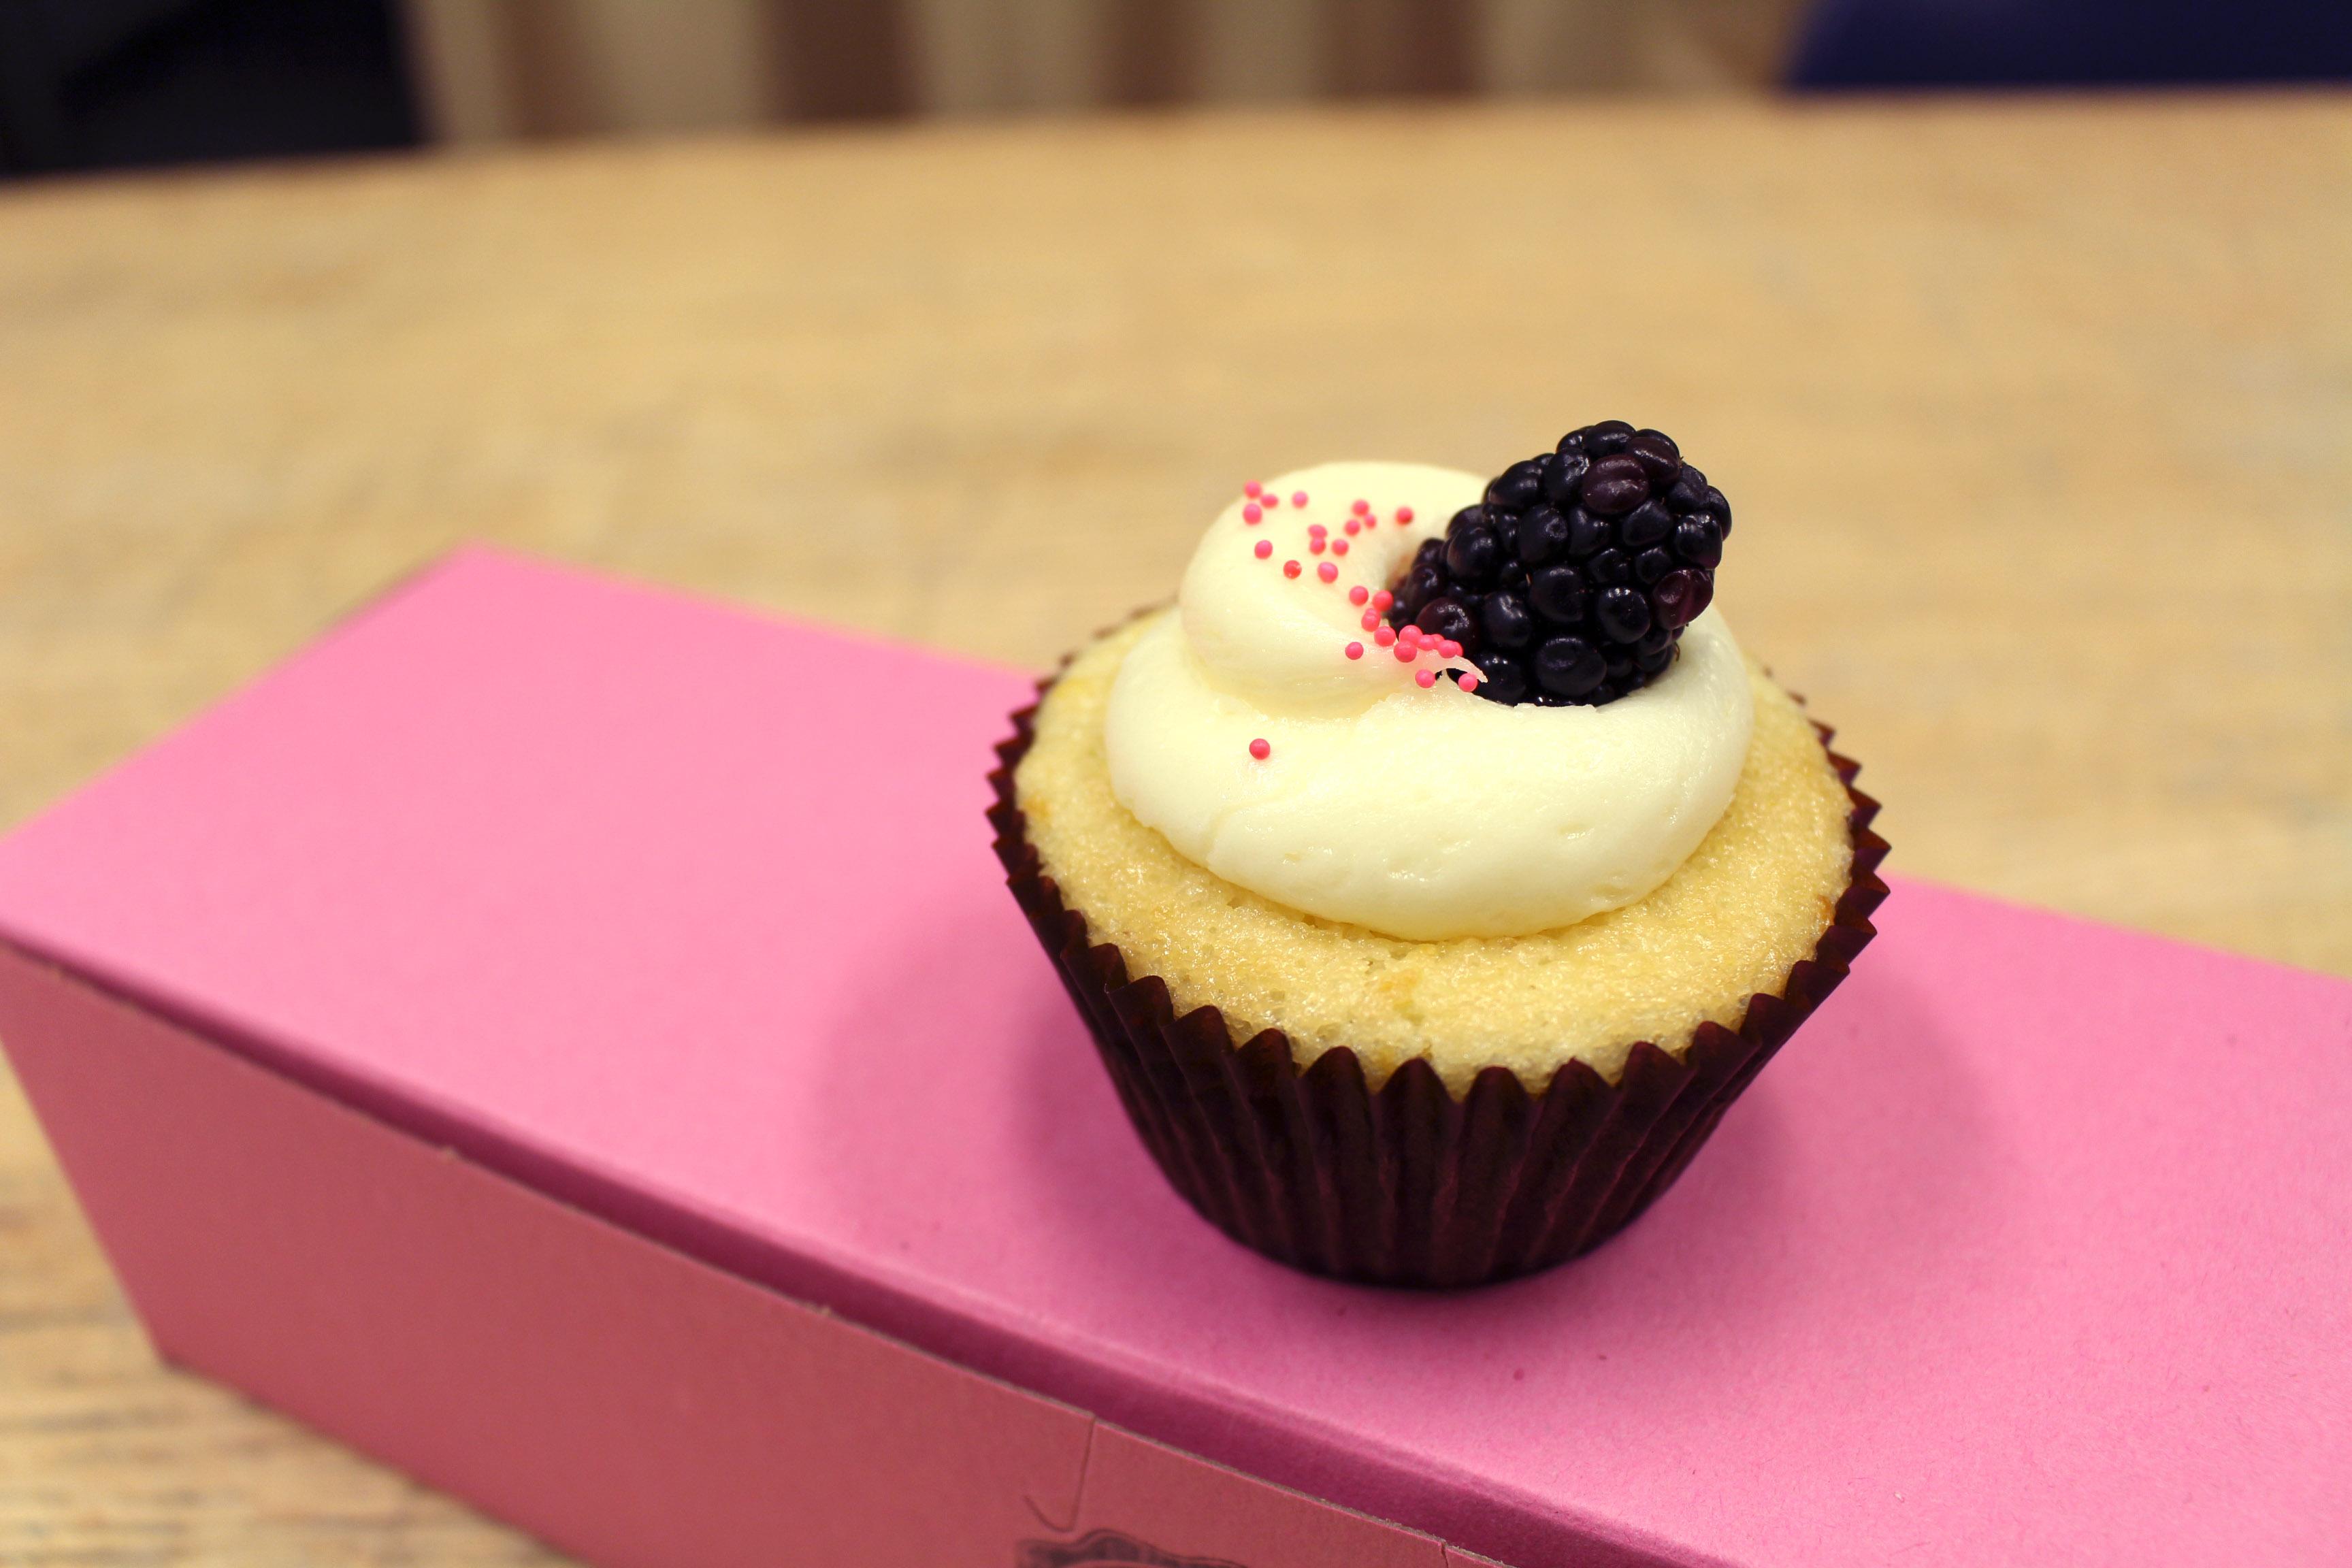 You are a Lemon Blackberry cupcake!